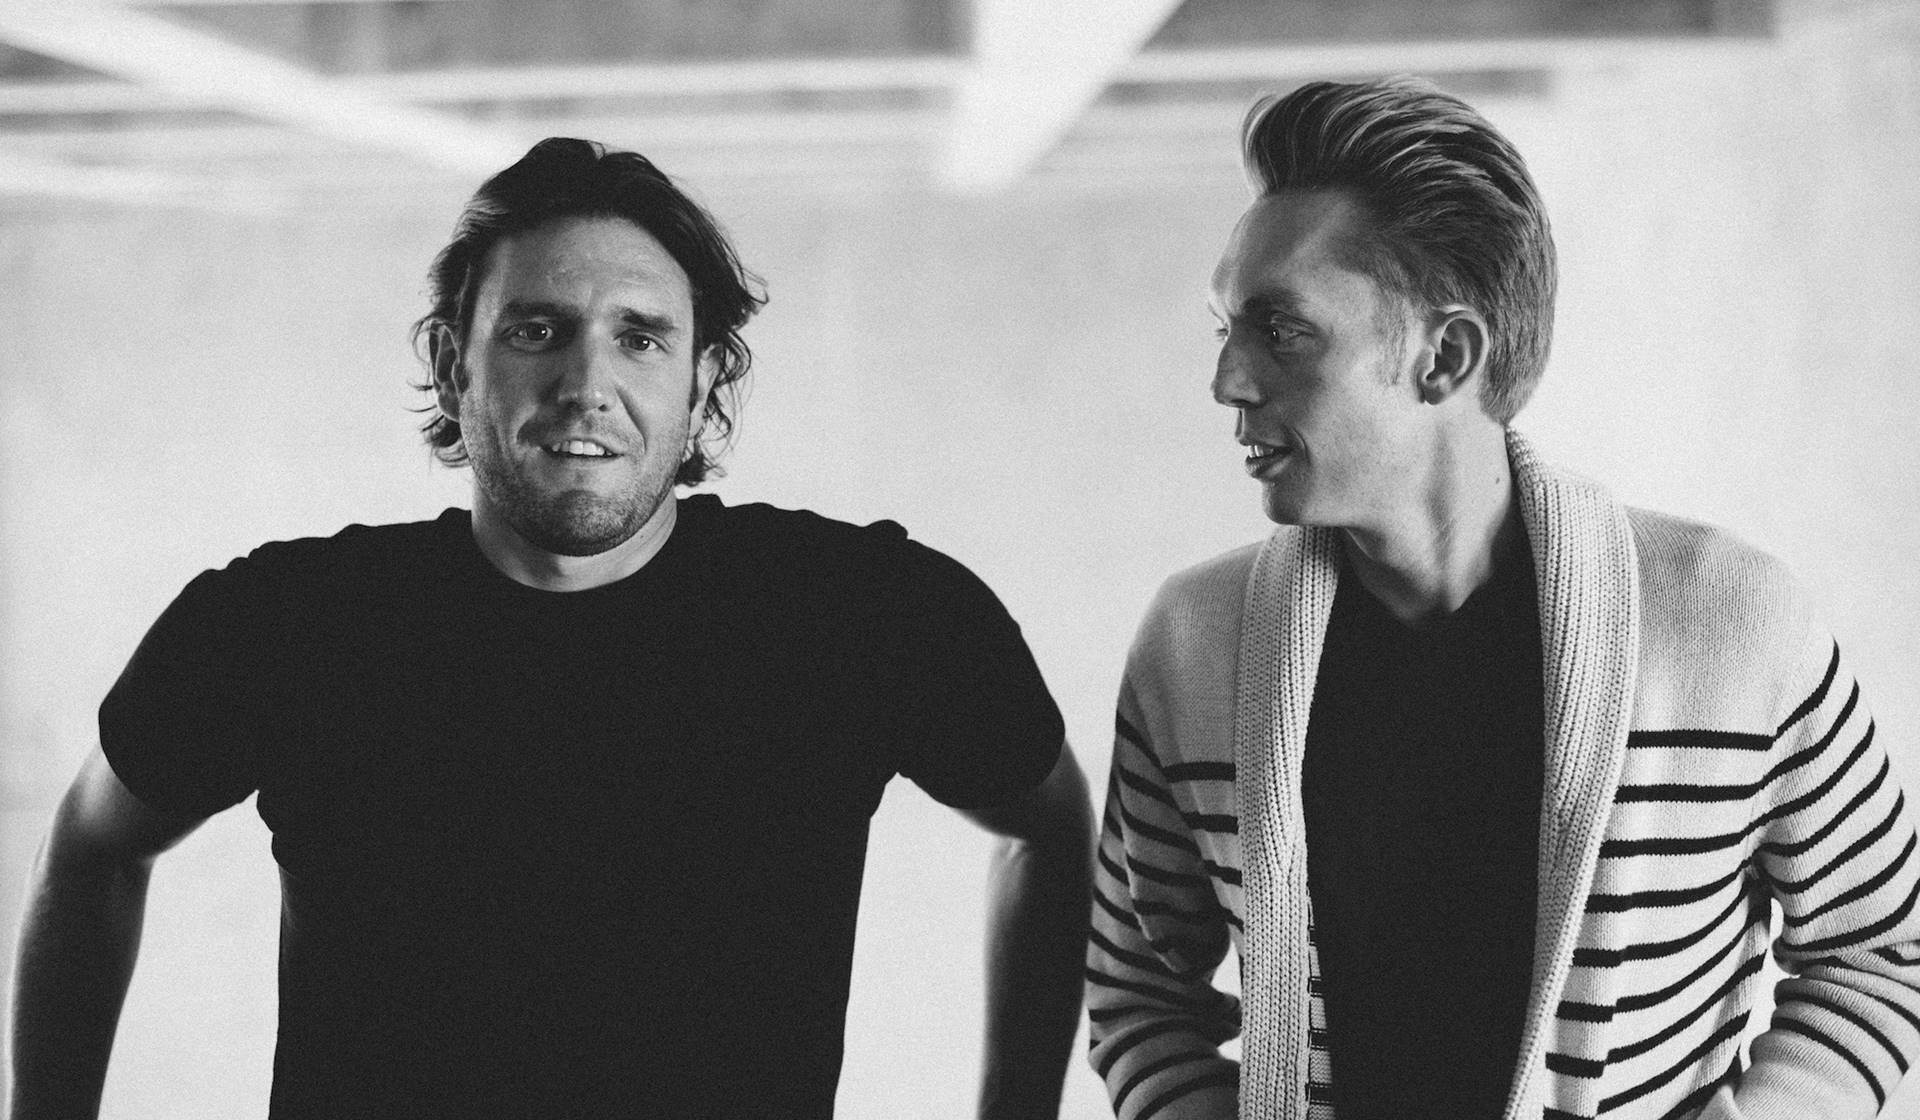 Less is Now, segundo documental de Joshua Fields y Ryan Nicodemus sobre minimalismo.